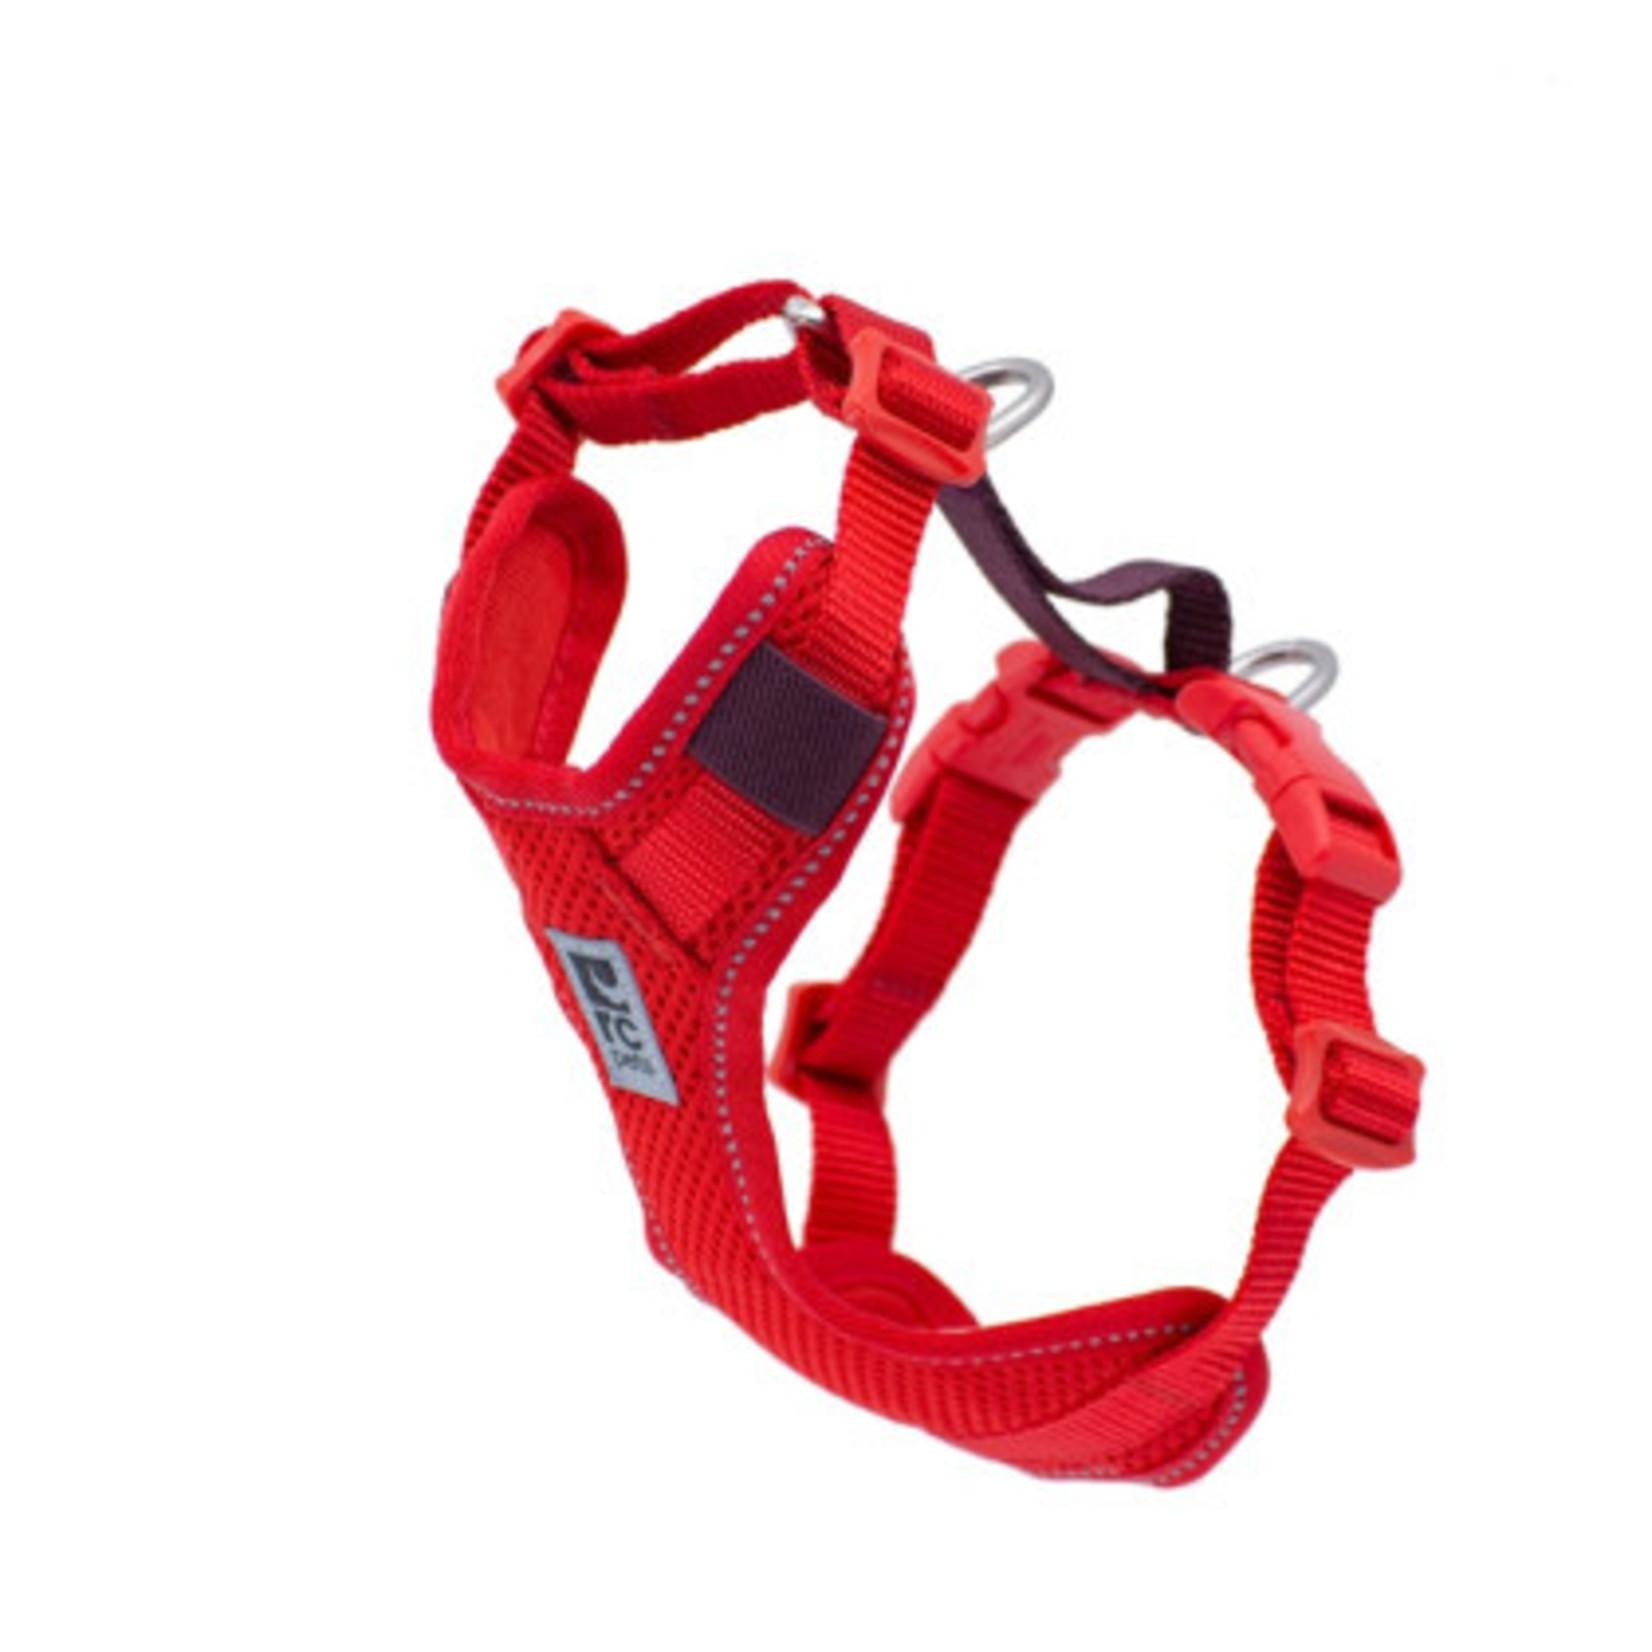 RC Pets Moto Control Harness